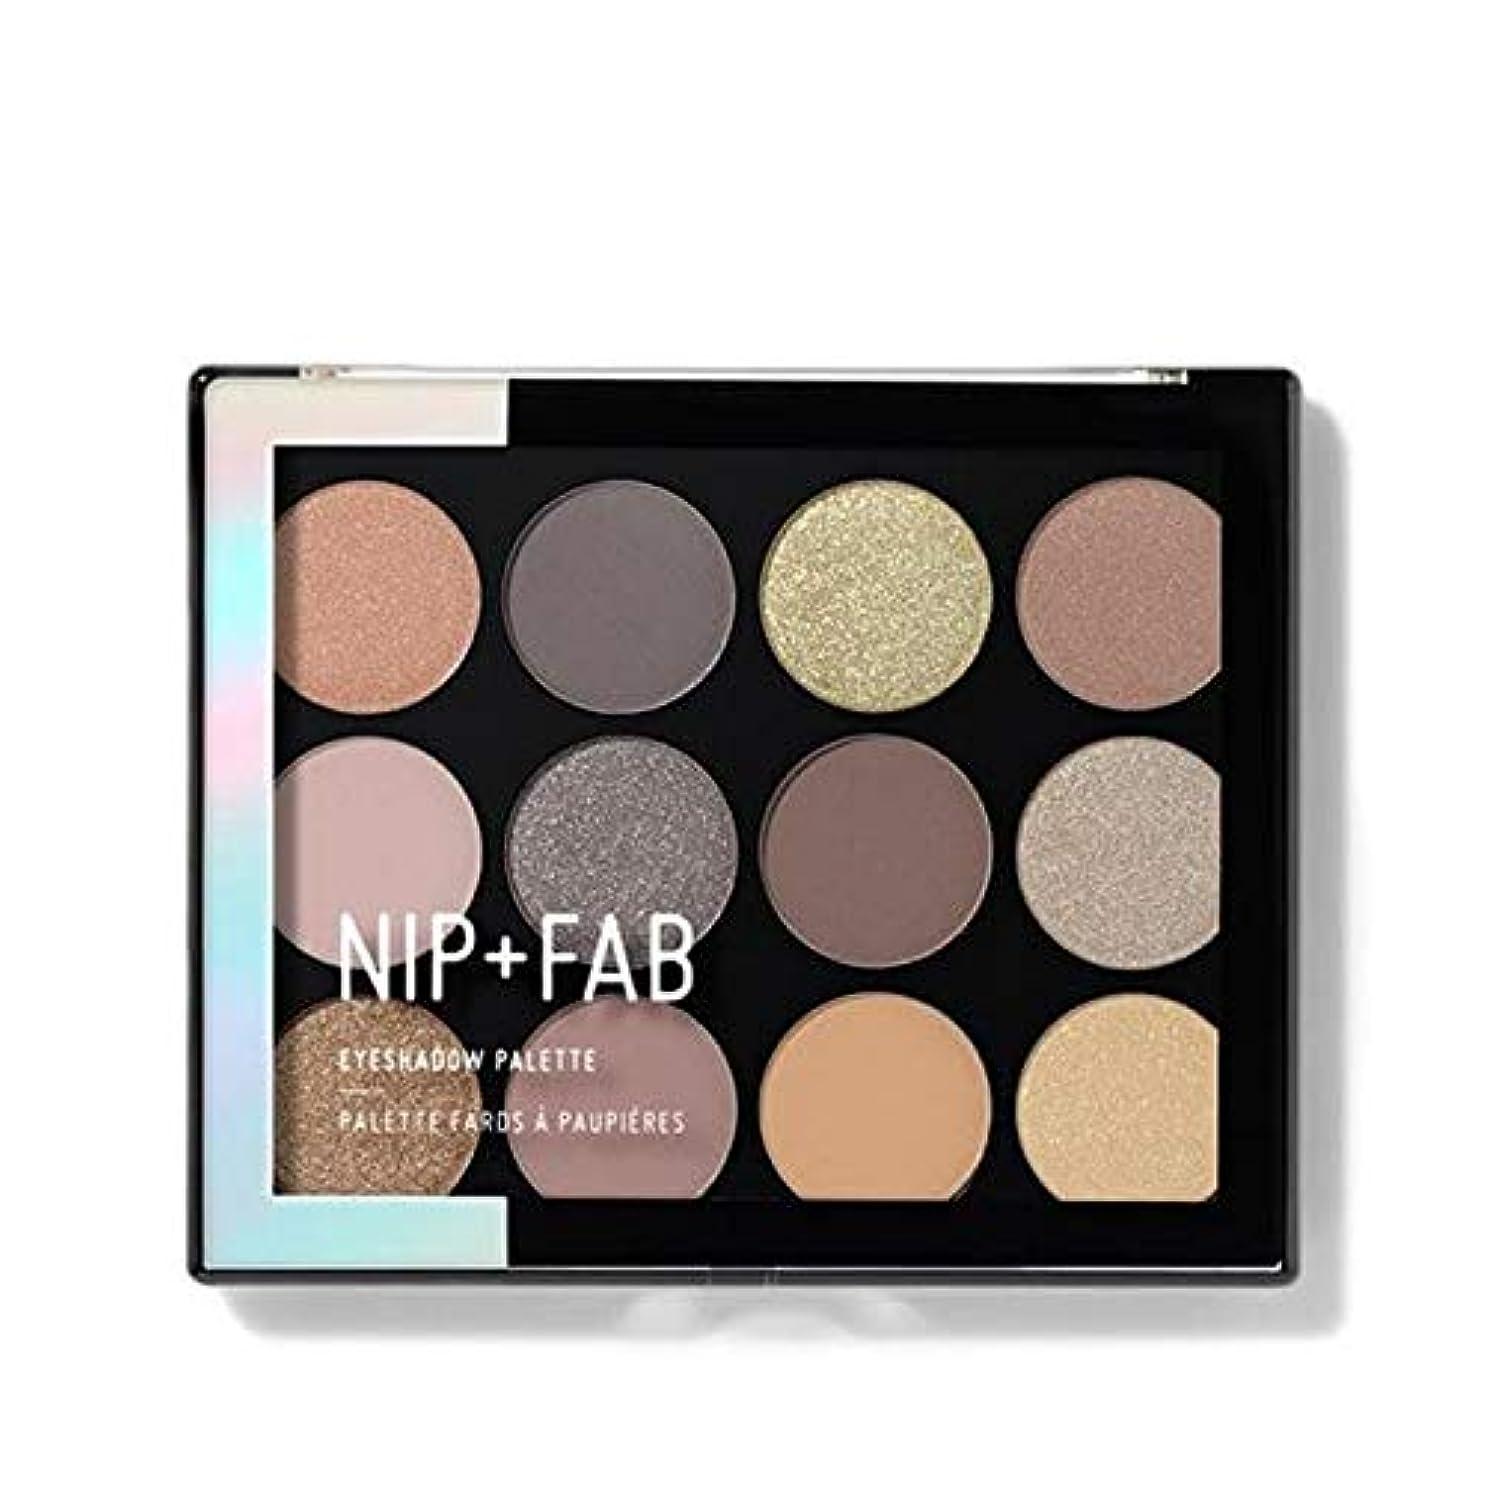 [Nip & Fab ] アイシャドウパレット12グラム穏やかグラム4を構成するFab +ニップ - NIP+FAB Make Up Eyeshadow Palette 12g Gentle Glam 4 [並行輸入品]